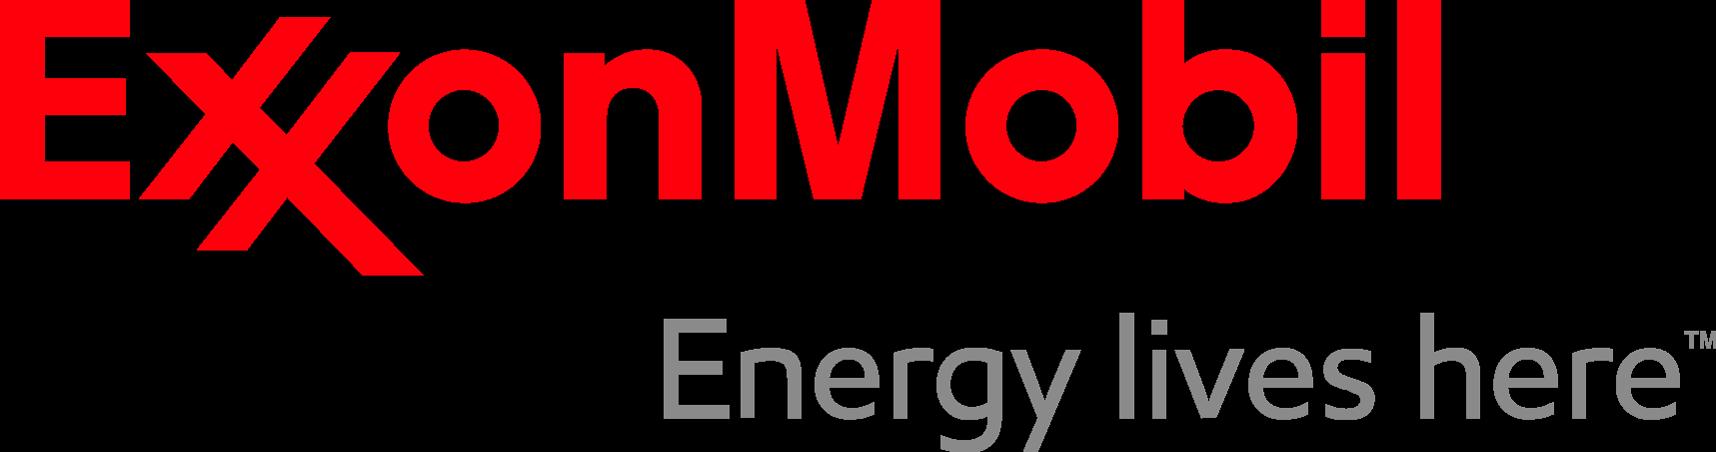 Esso (Thailand) Public Company Limited